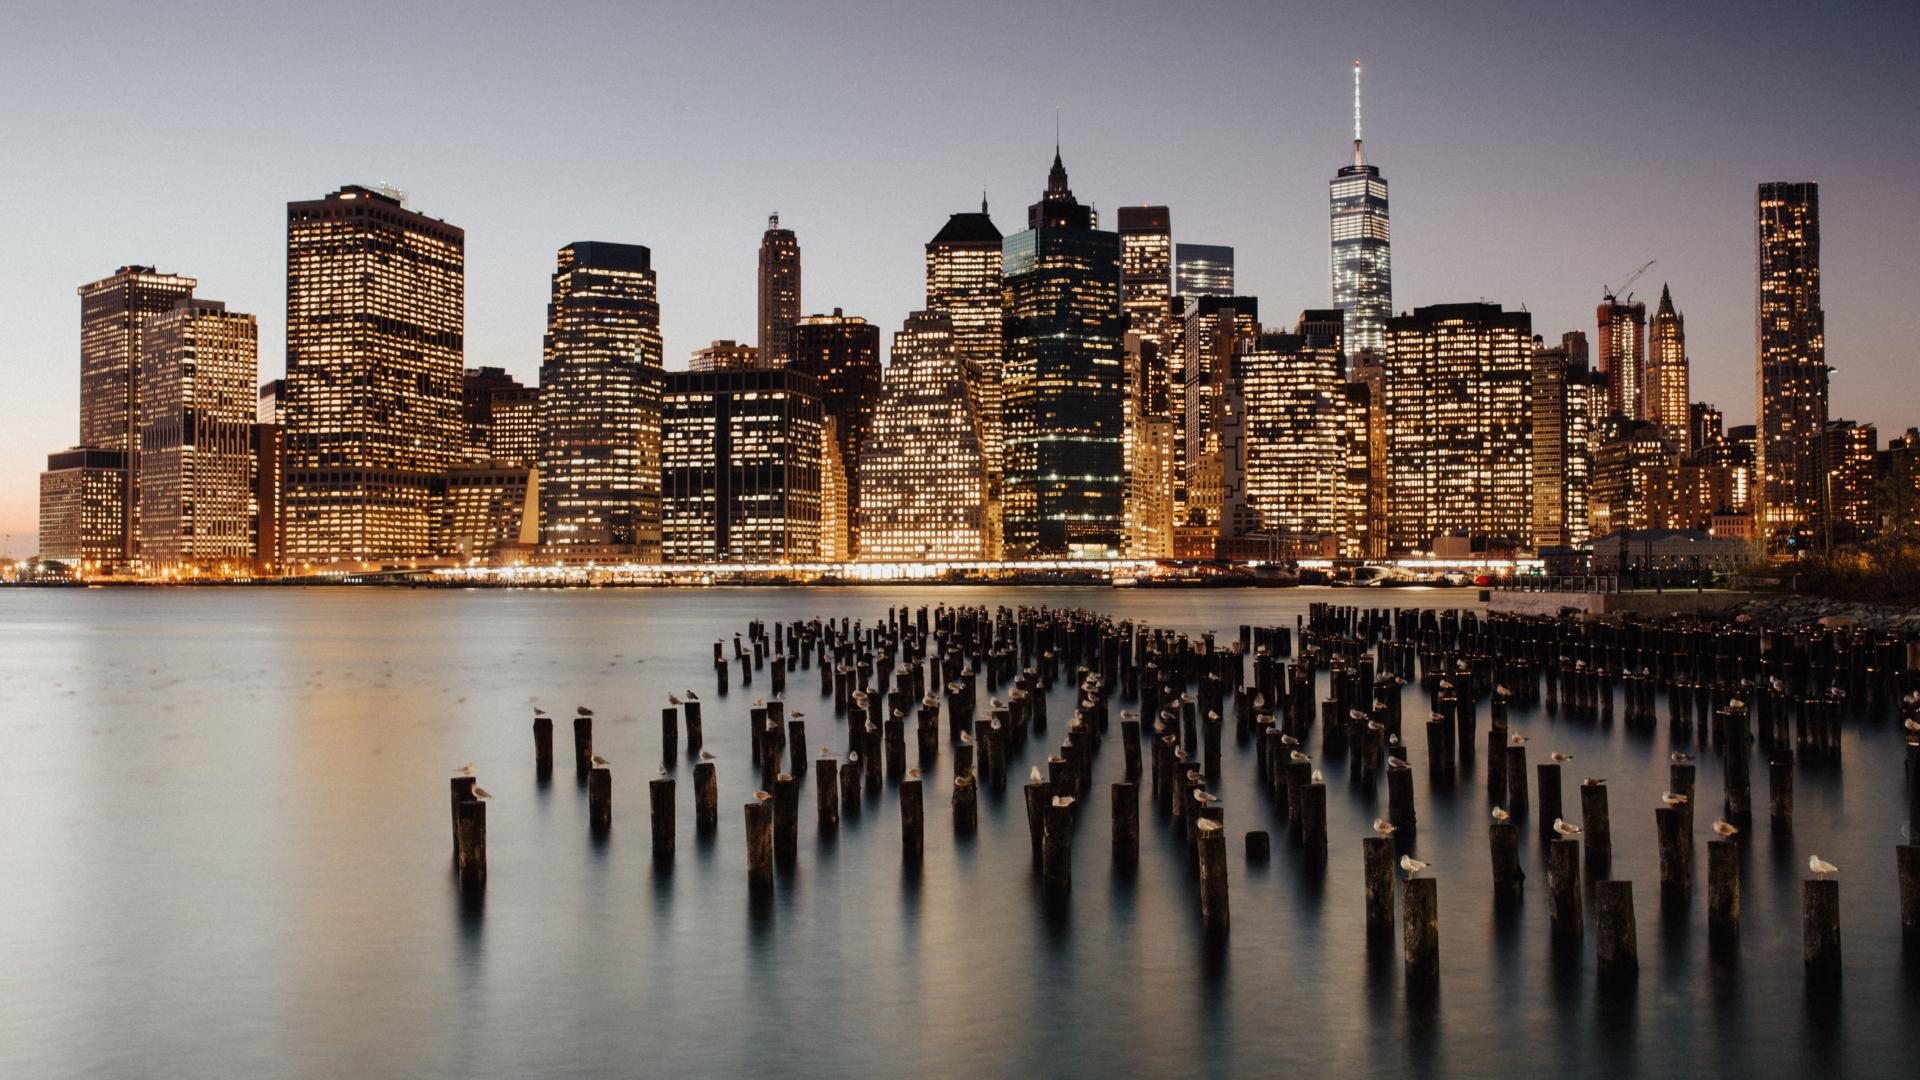 Download 1920x1080 Wallpaper New York City Brooklyn Night Full Hd Hdtv Fhd 1080p 1920x1080 Hd Image Background 10123